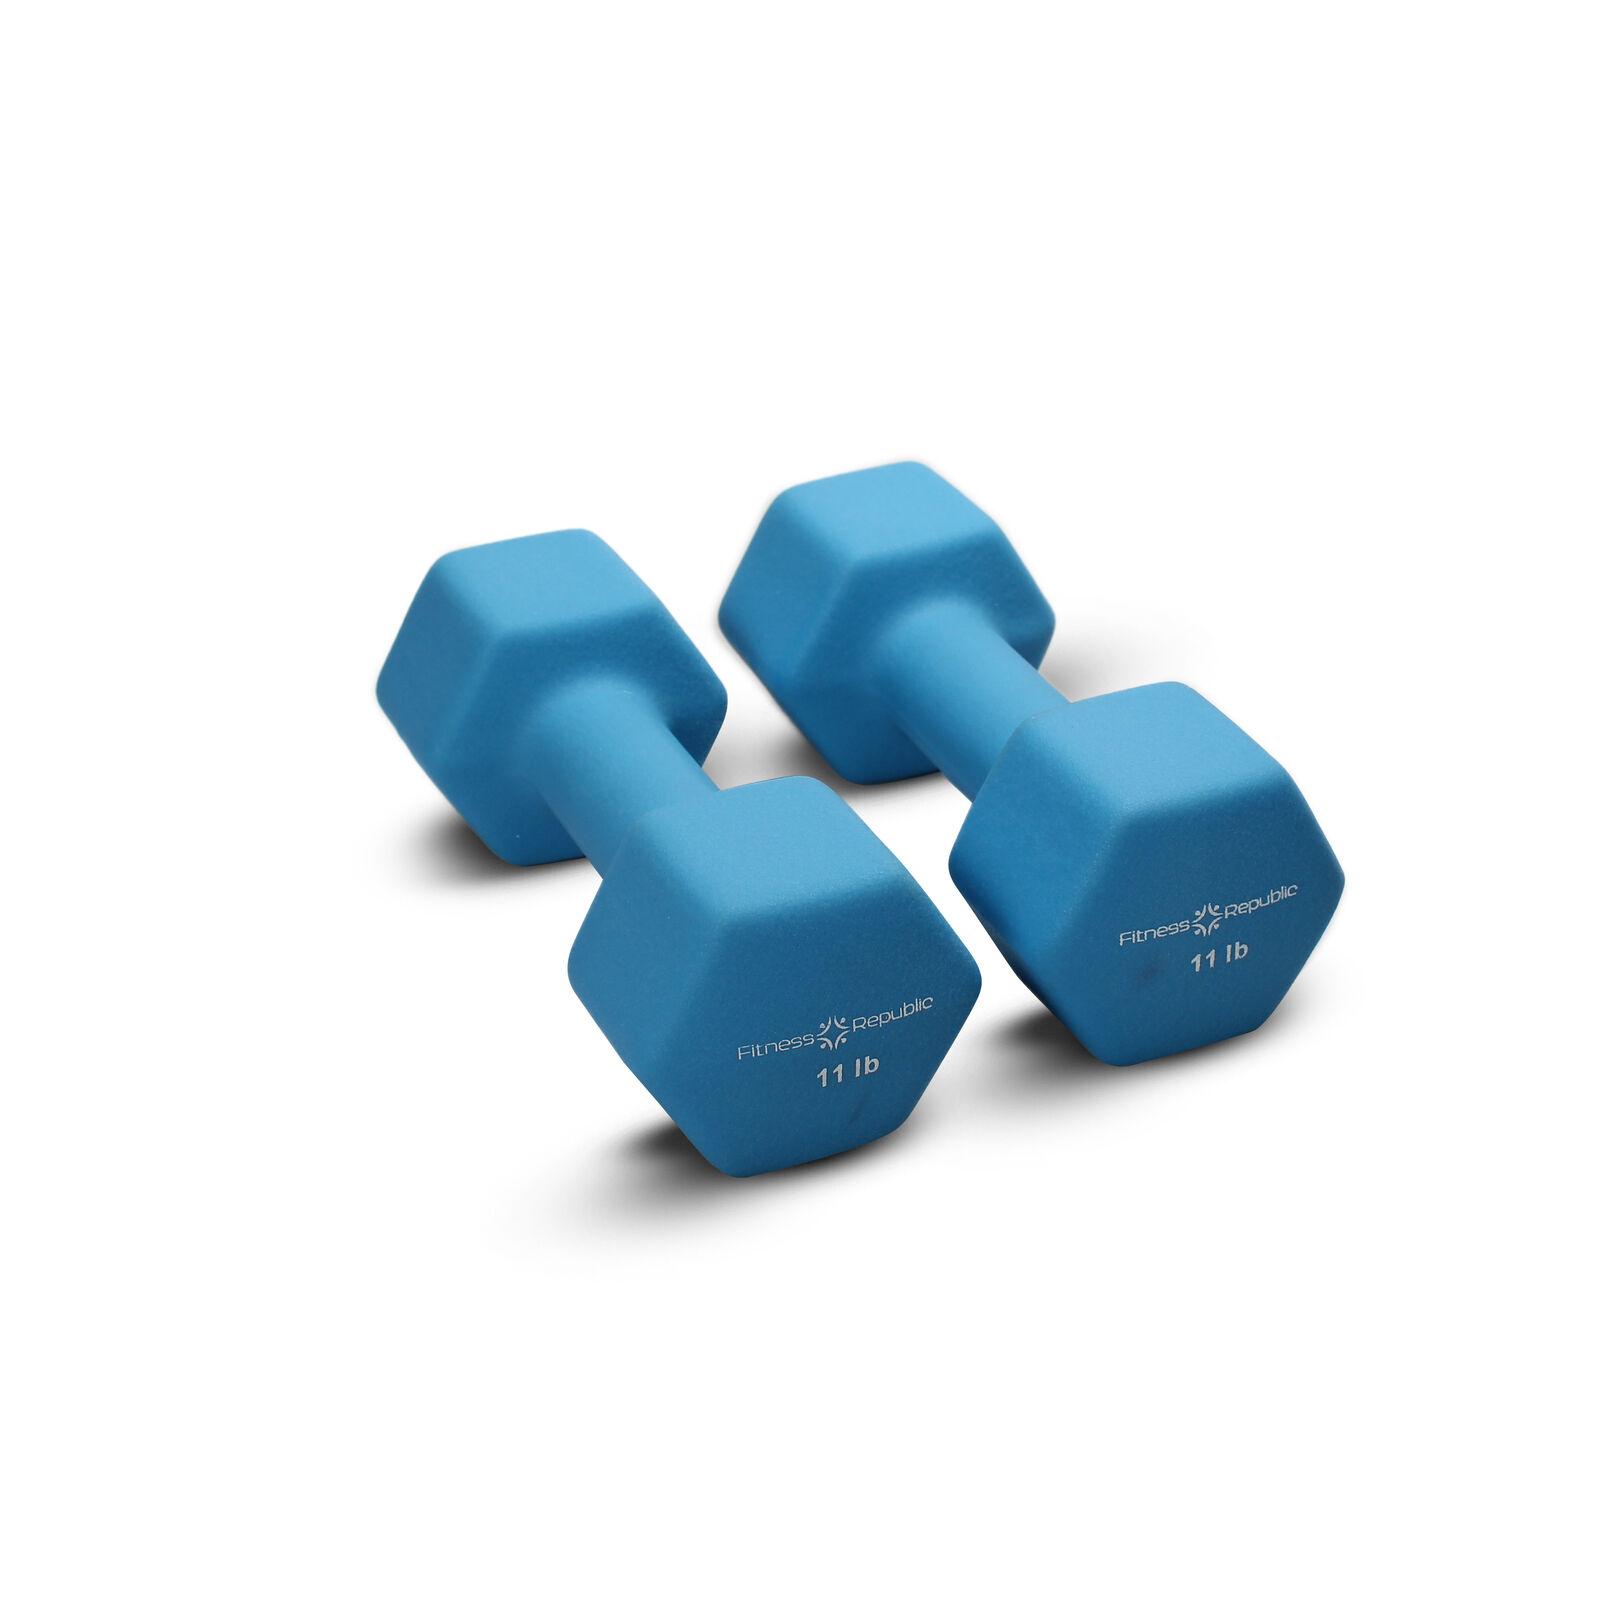 Fitness Dumbbells Republic Neoprene Dumbbells Fitness 11 lbs Set (Neoprene Weights) a25a78